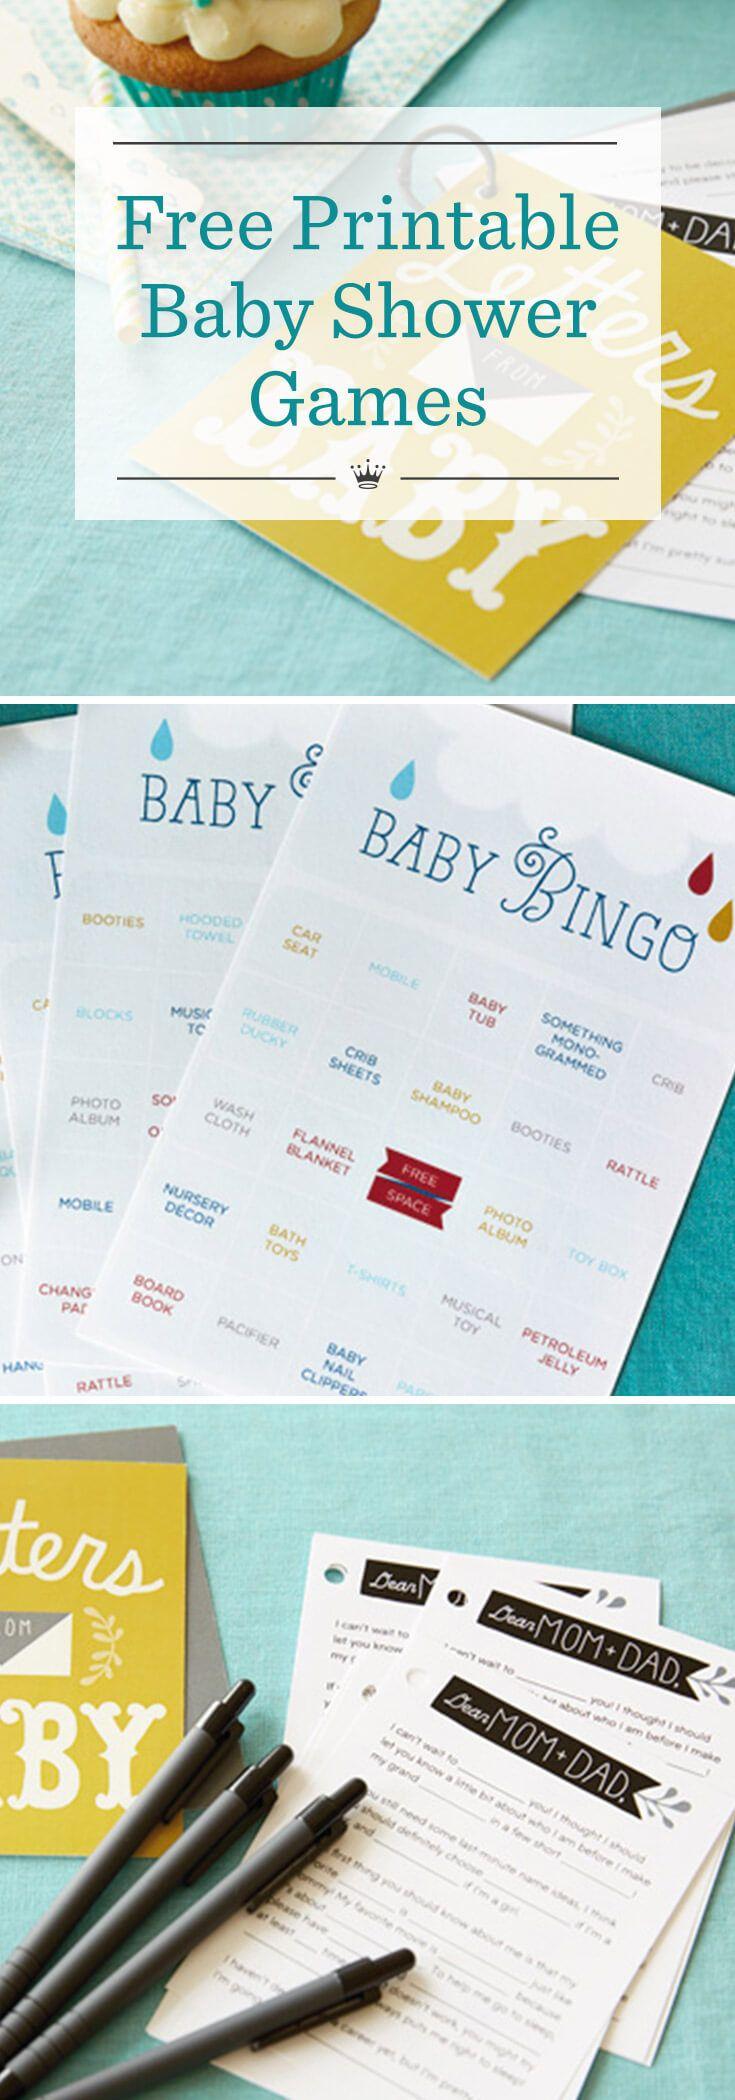 Free printable baby shower games | Baby keepsake book, Fun ...